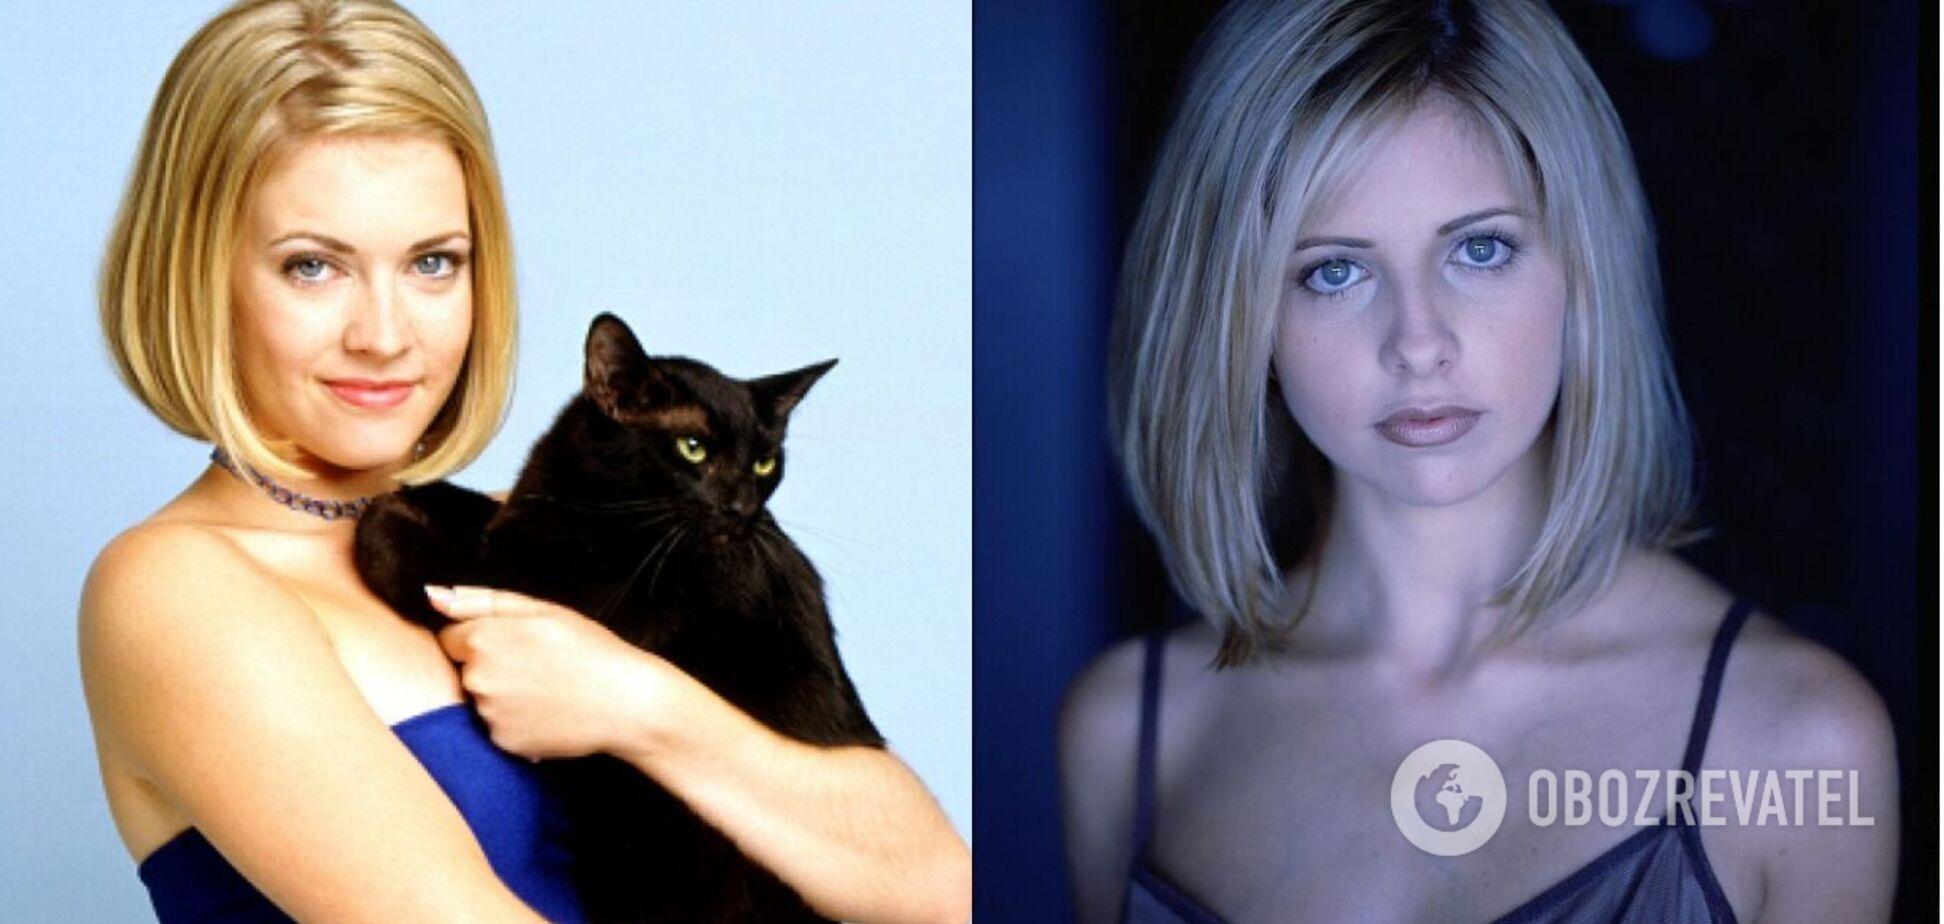 Как сейчас выглядят звезды сериалов 'Баффи', 'Сабрина' и 'Ксена: принцесса-воин'. Фото